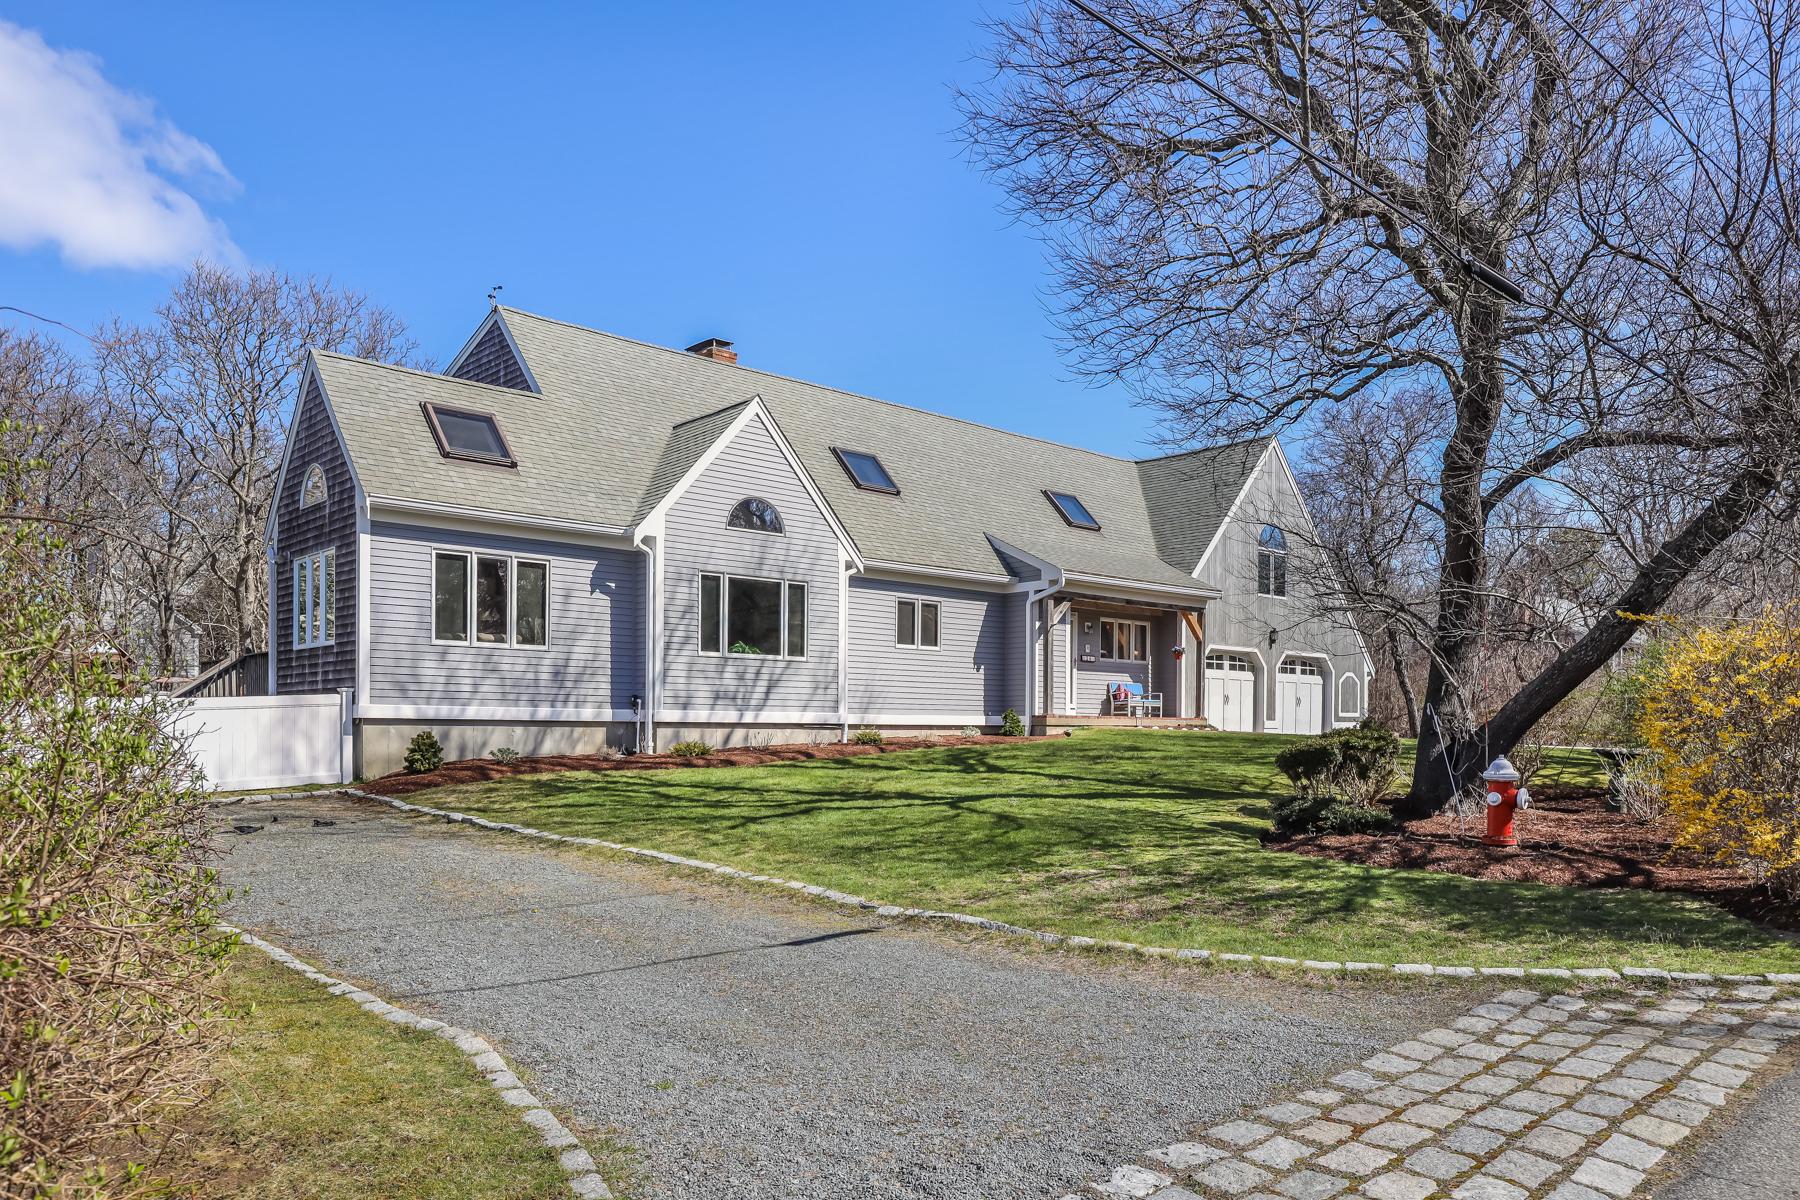 Single Family Homes για την Πώληση στο Dennis, Μασαχουσετη 02638 Ηνωμένες Πολιτείες